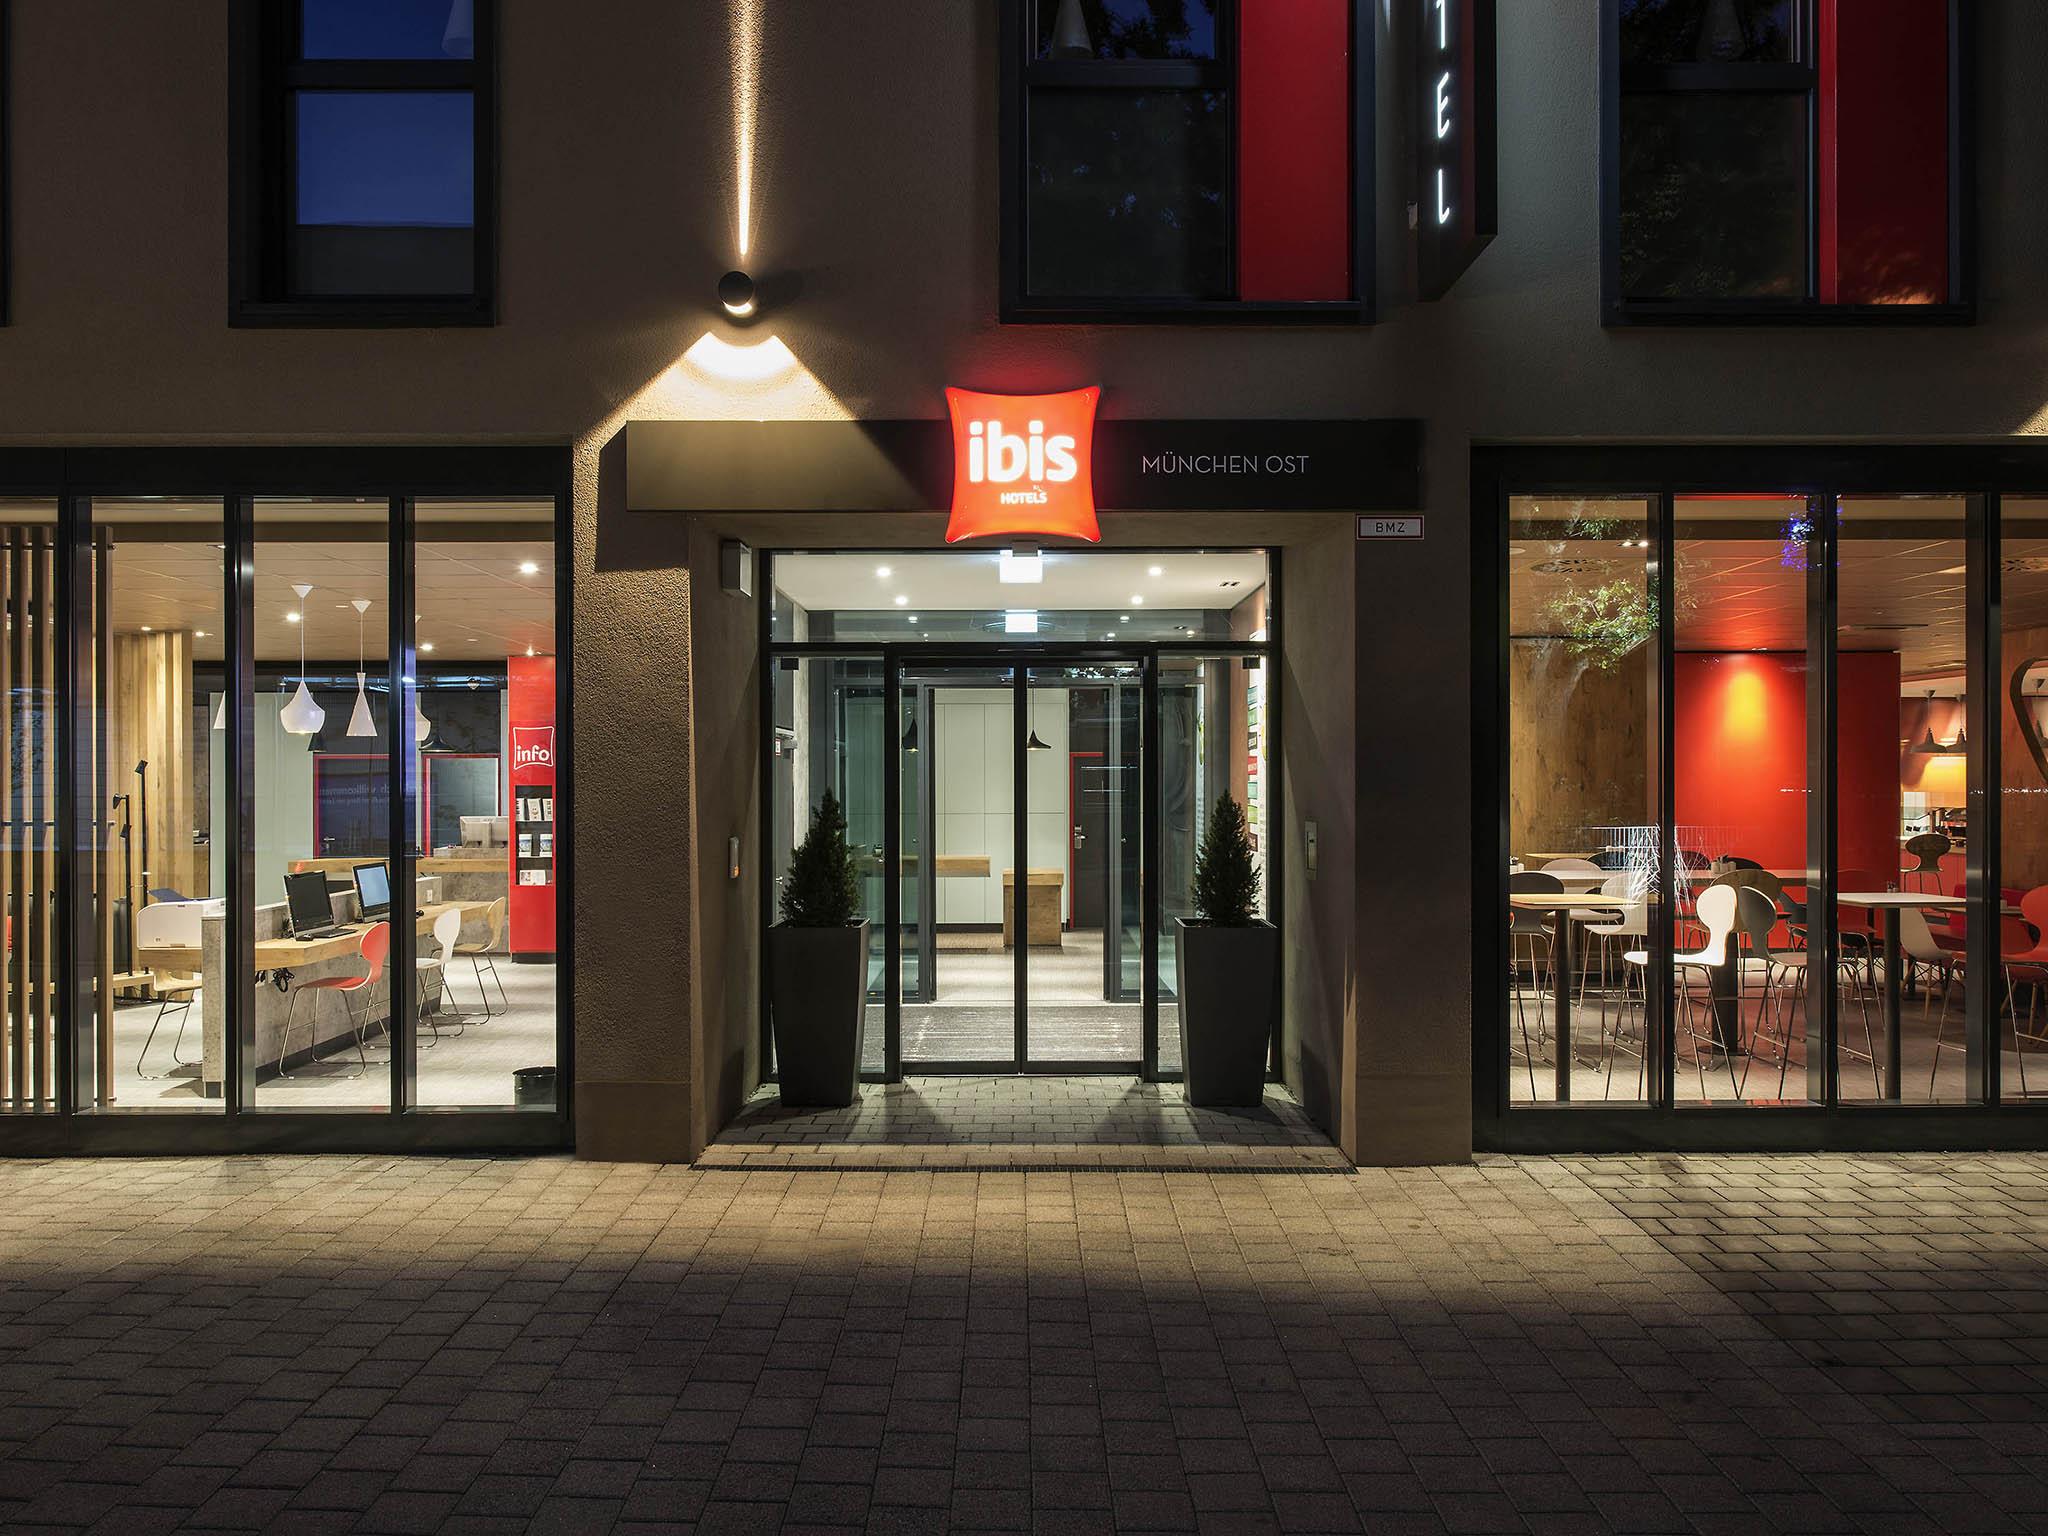 فندق - إيبيس ibis مونشن سيتي أوست